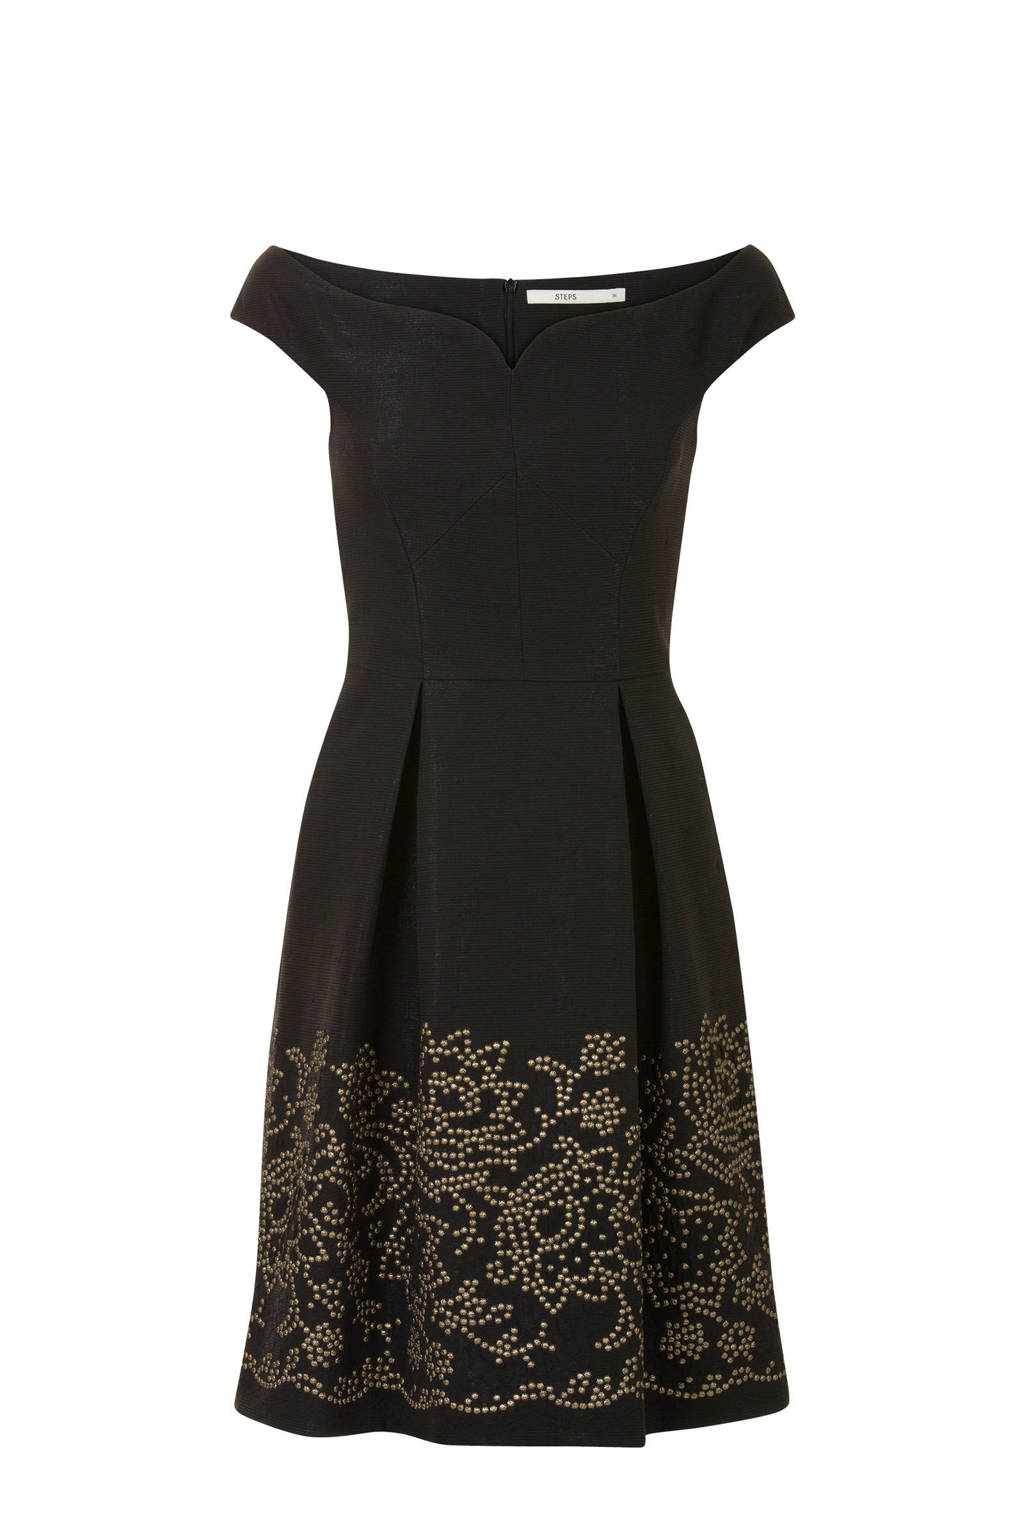 Steps offshoulder jurk met gouden studs zwart, Zwart